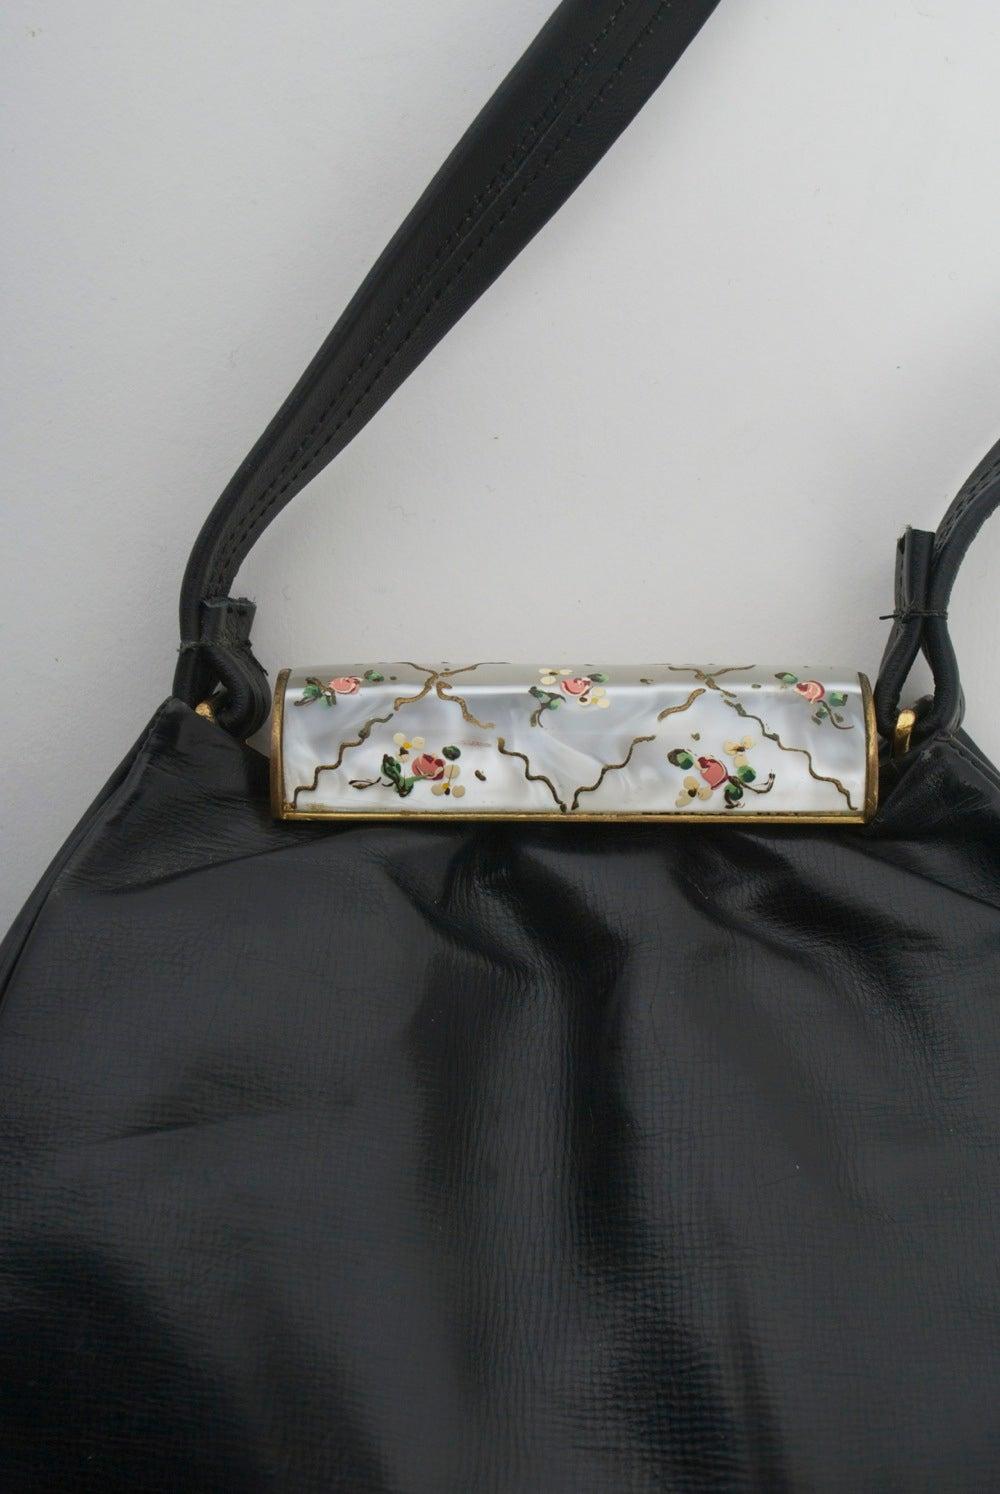 1stdibs Rosenfeld Handbag With Mop Clasp UBtQk8rG4U